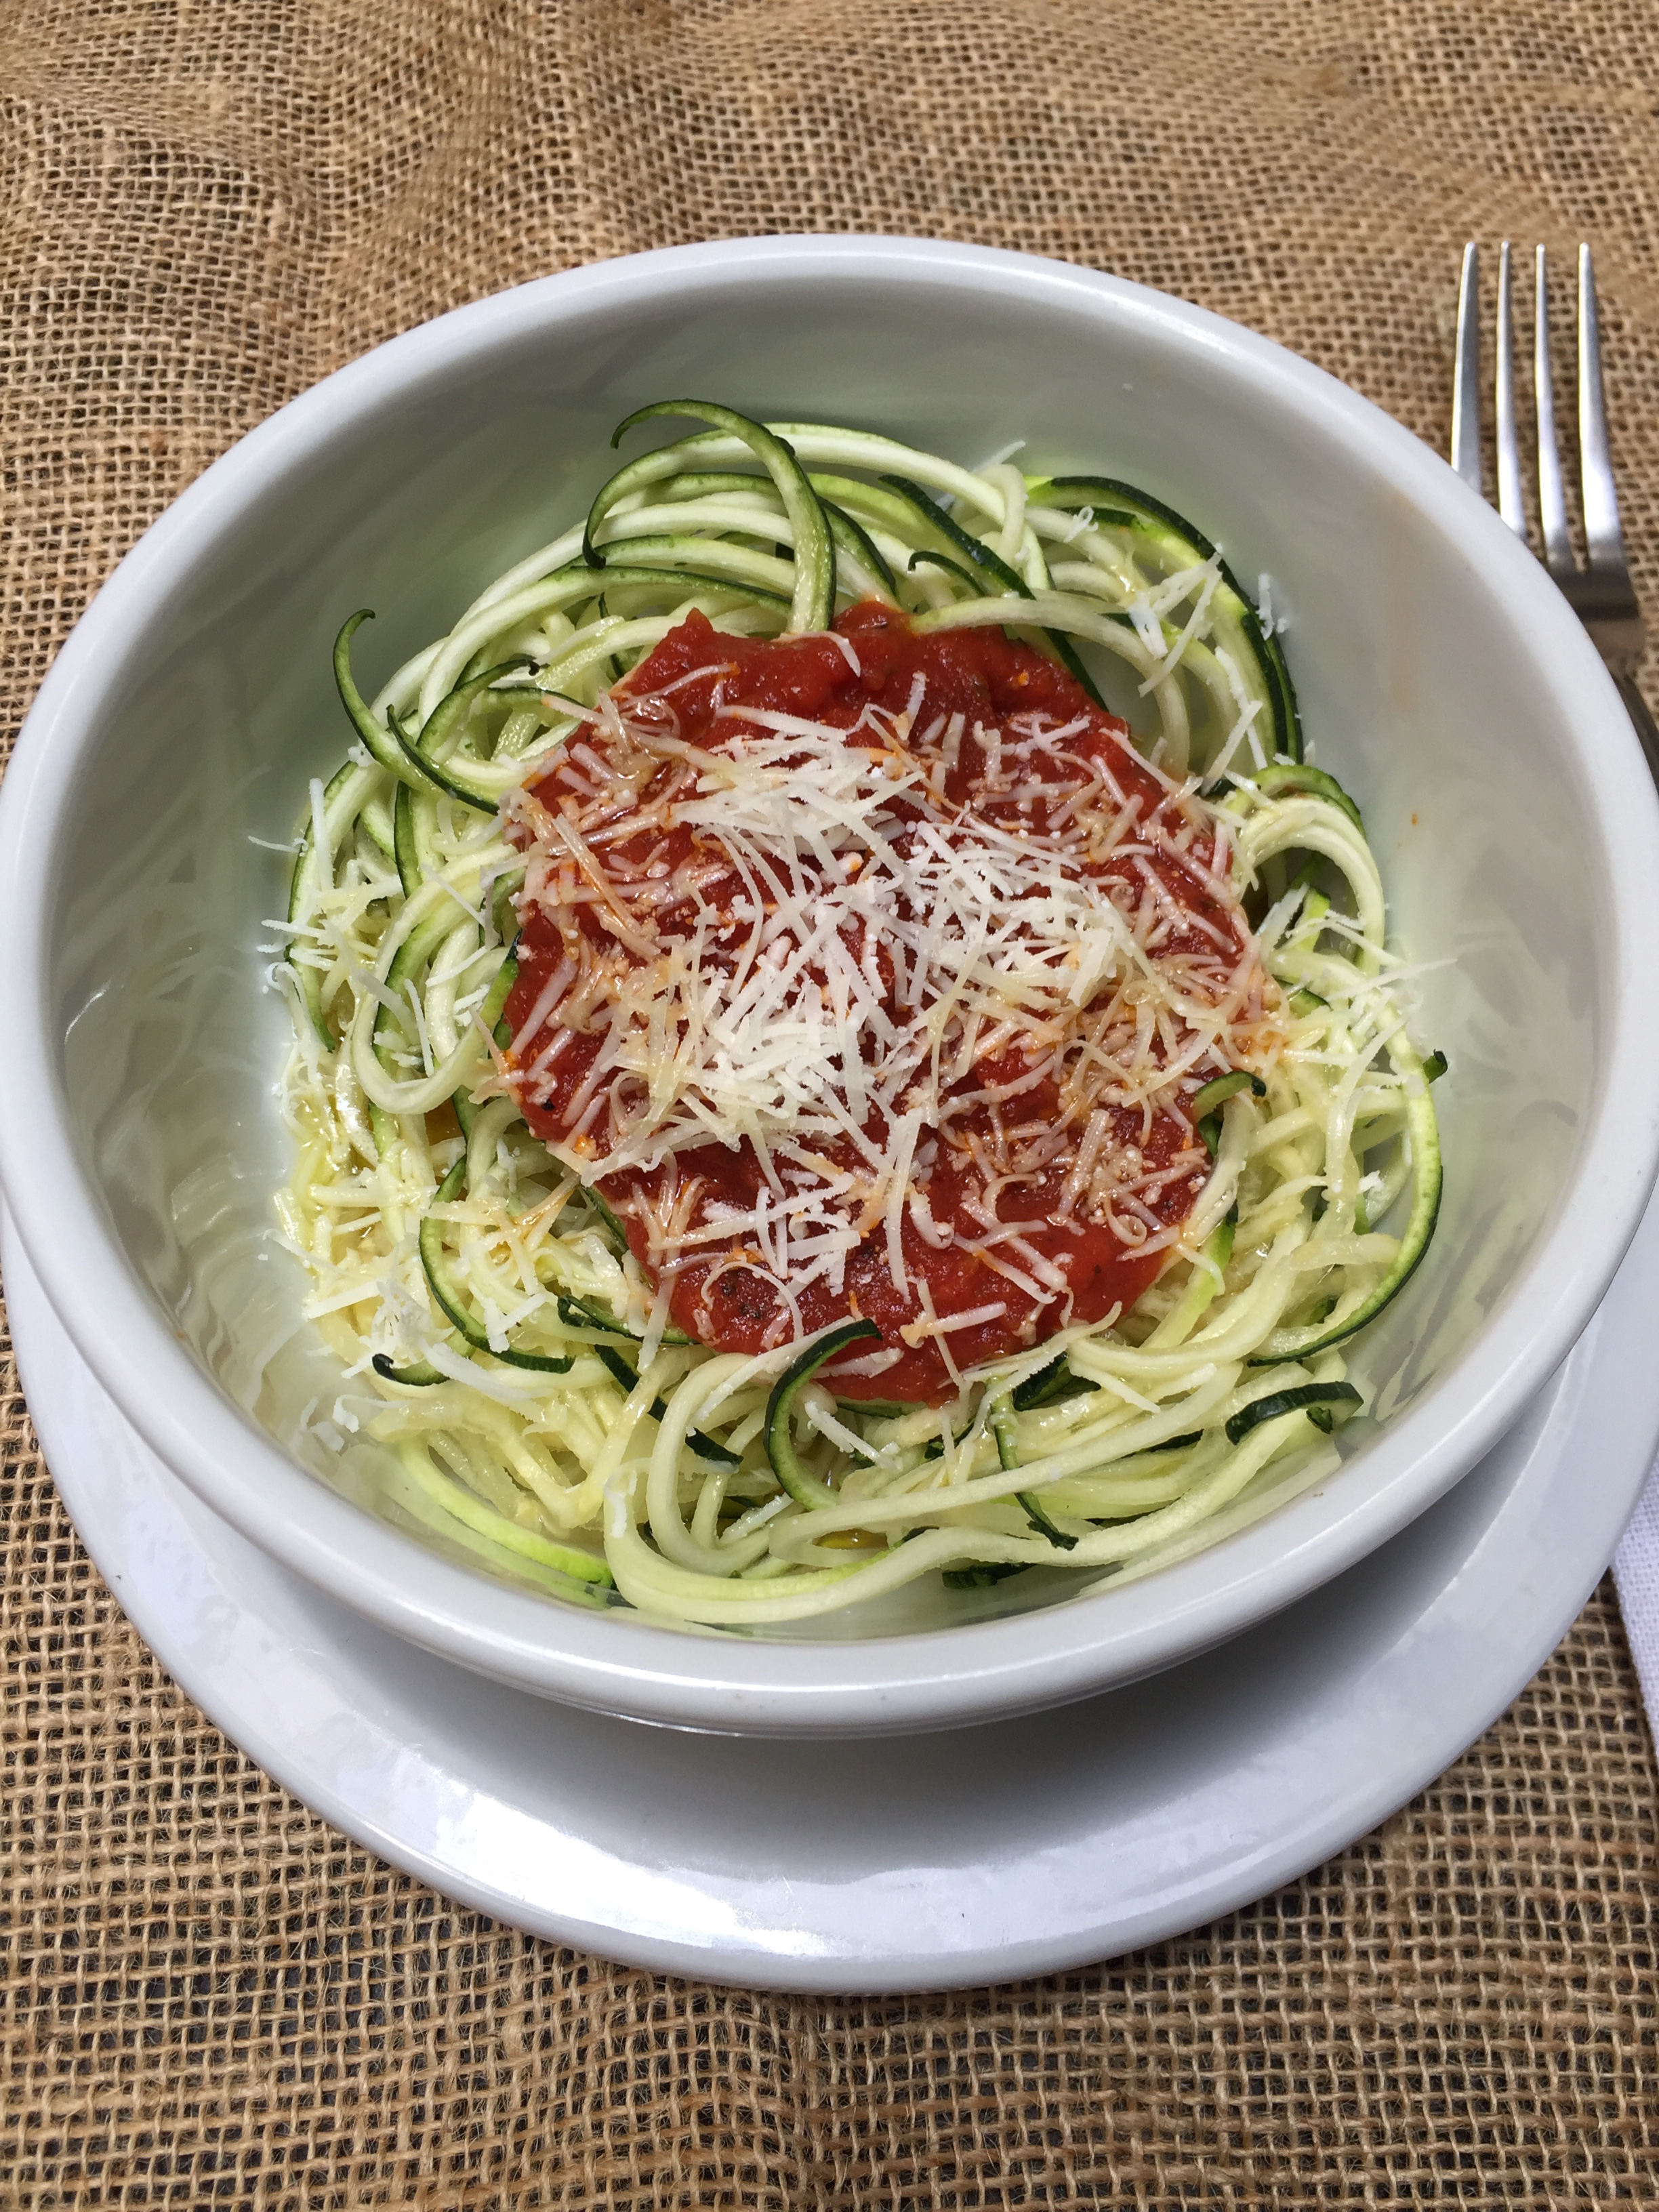 zucchini noodle marinara sauce white bowl